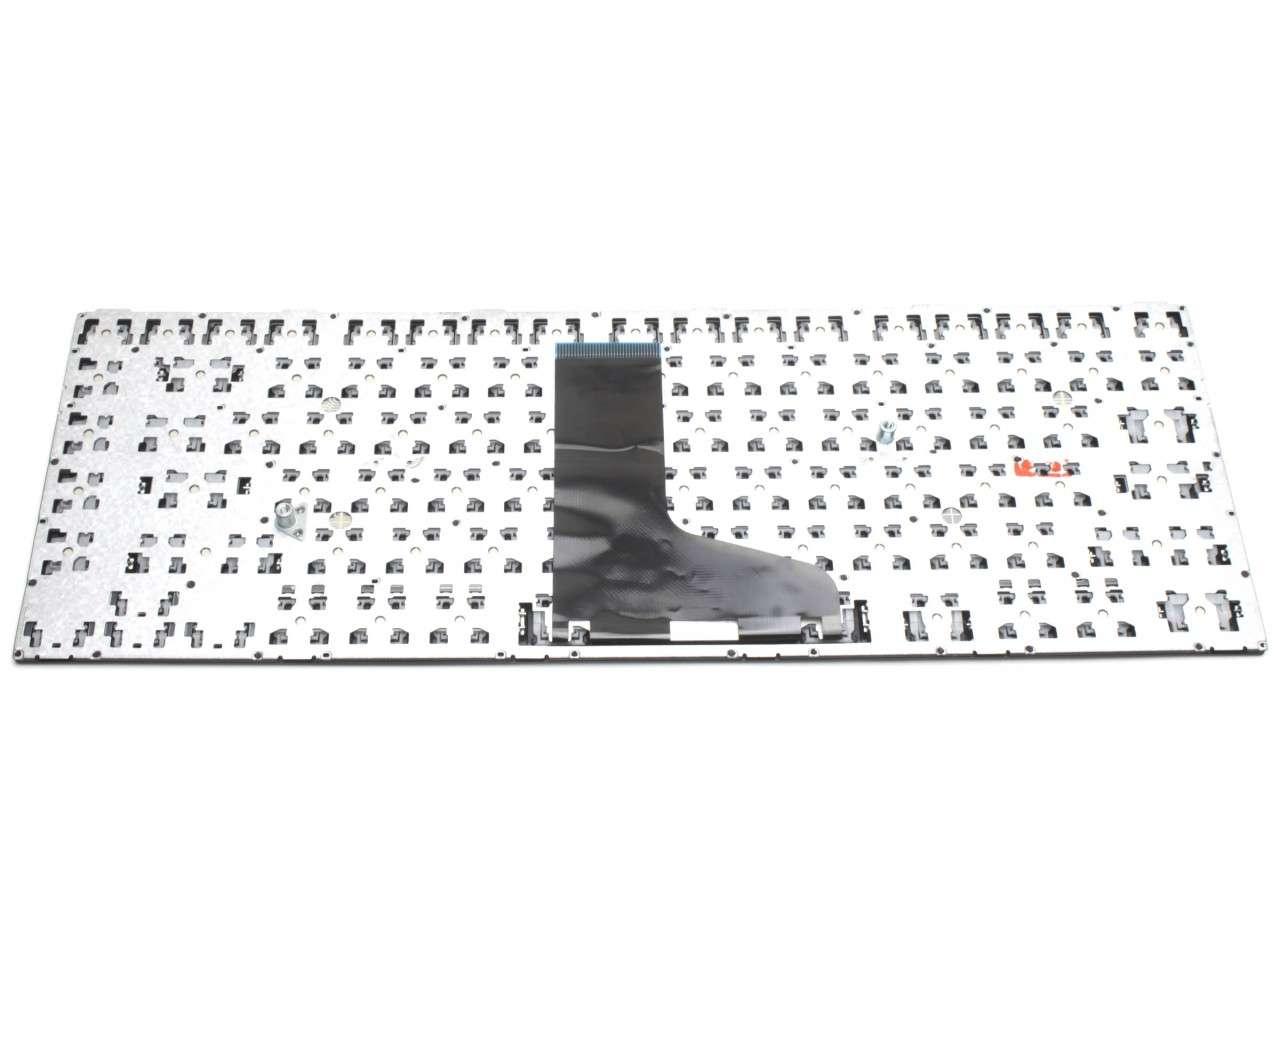 Tastatura Toshiba MP 11B86GB 920B imagine powerlaptop.ro 2021